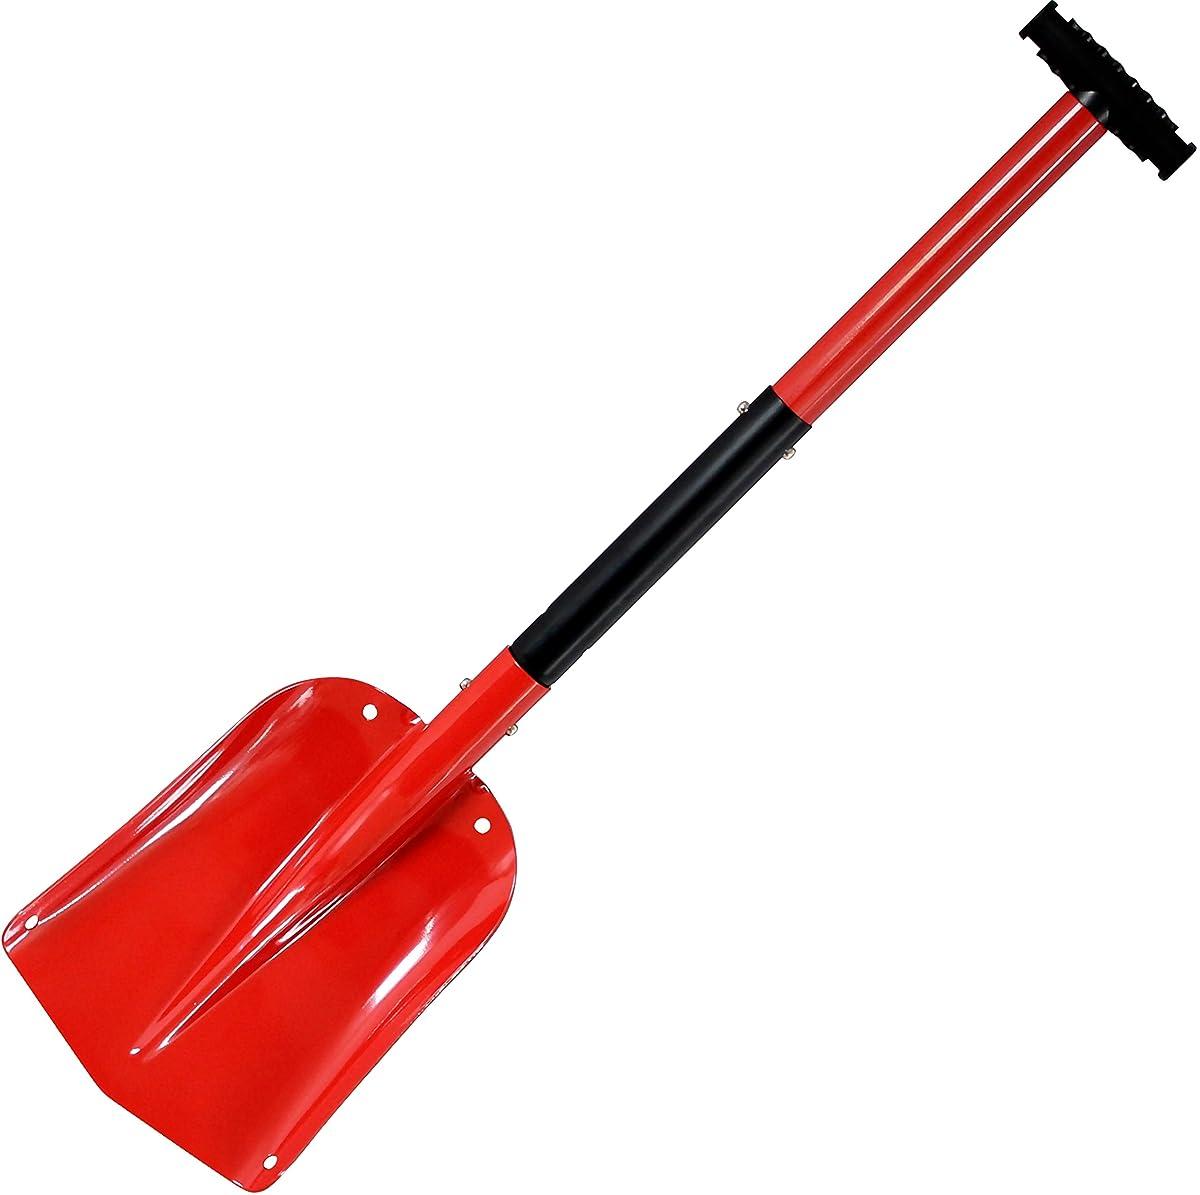 Cartman Portable Aluminium Sport Utility Shovel, Snow Shovel (Red)